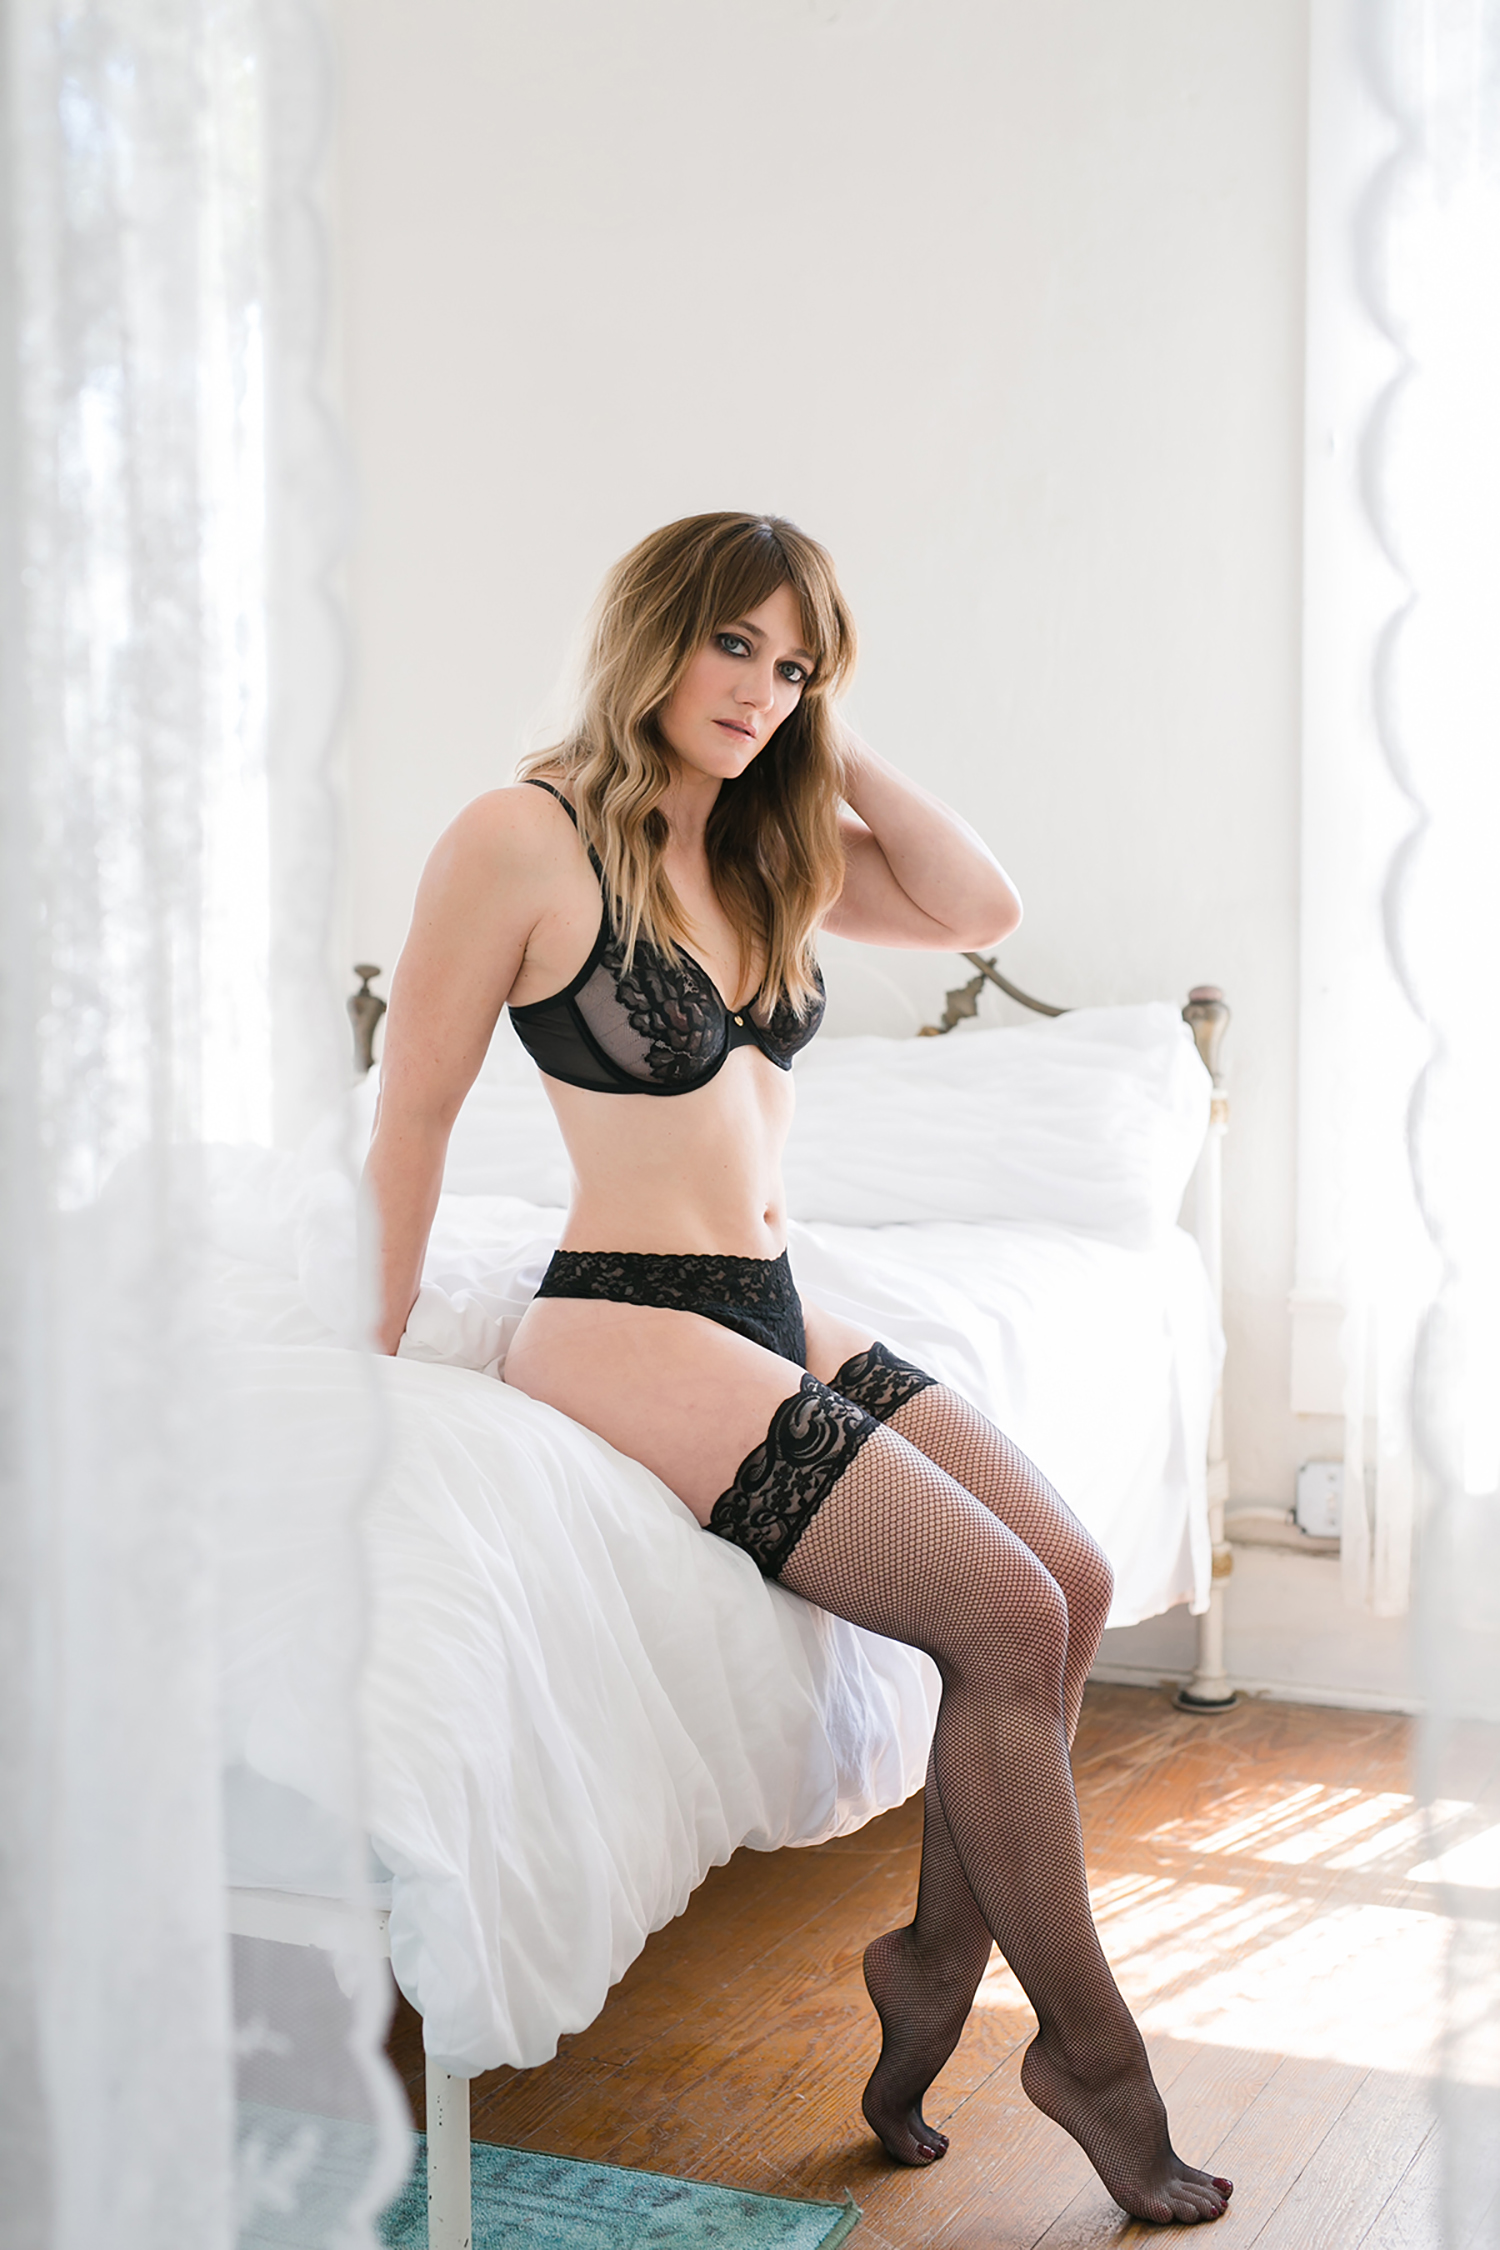 austin-atx-boudoir-artistic-nudes--kbb19.jpg